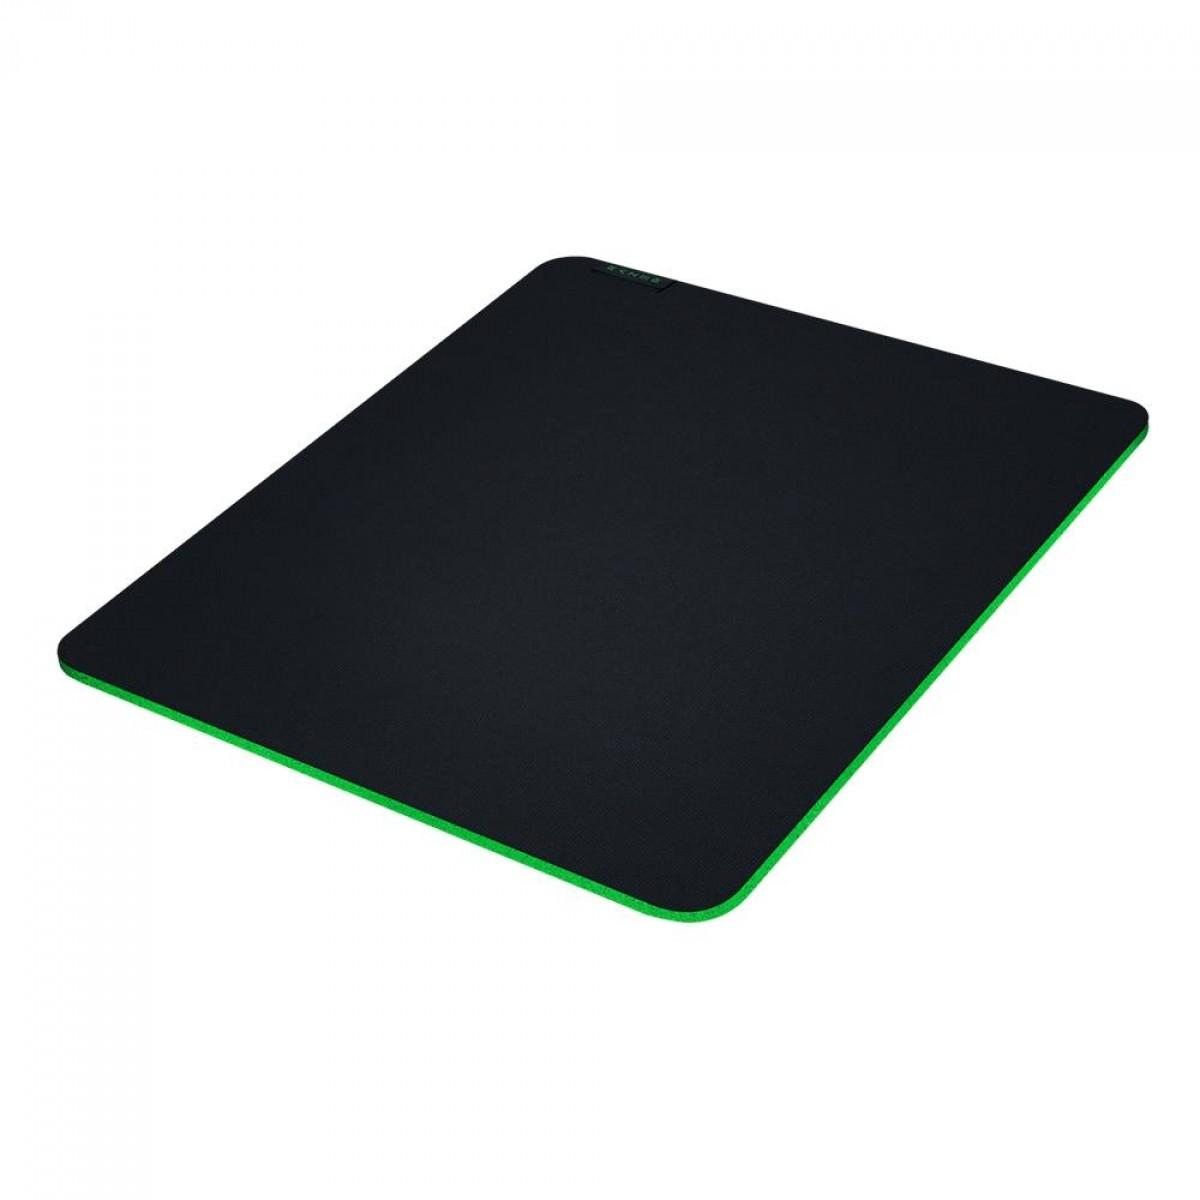 Mousepad Gamer Razer Gigantus V2, Control/Speed, Médio (360x275mm), RZ02-03330200-R3U1